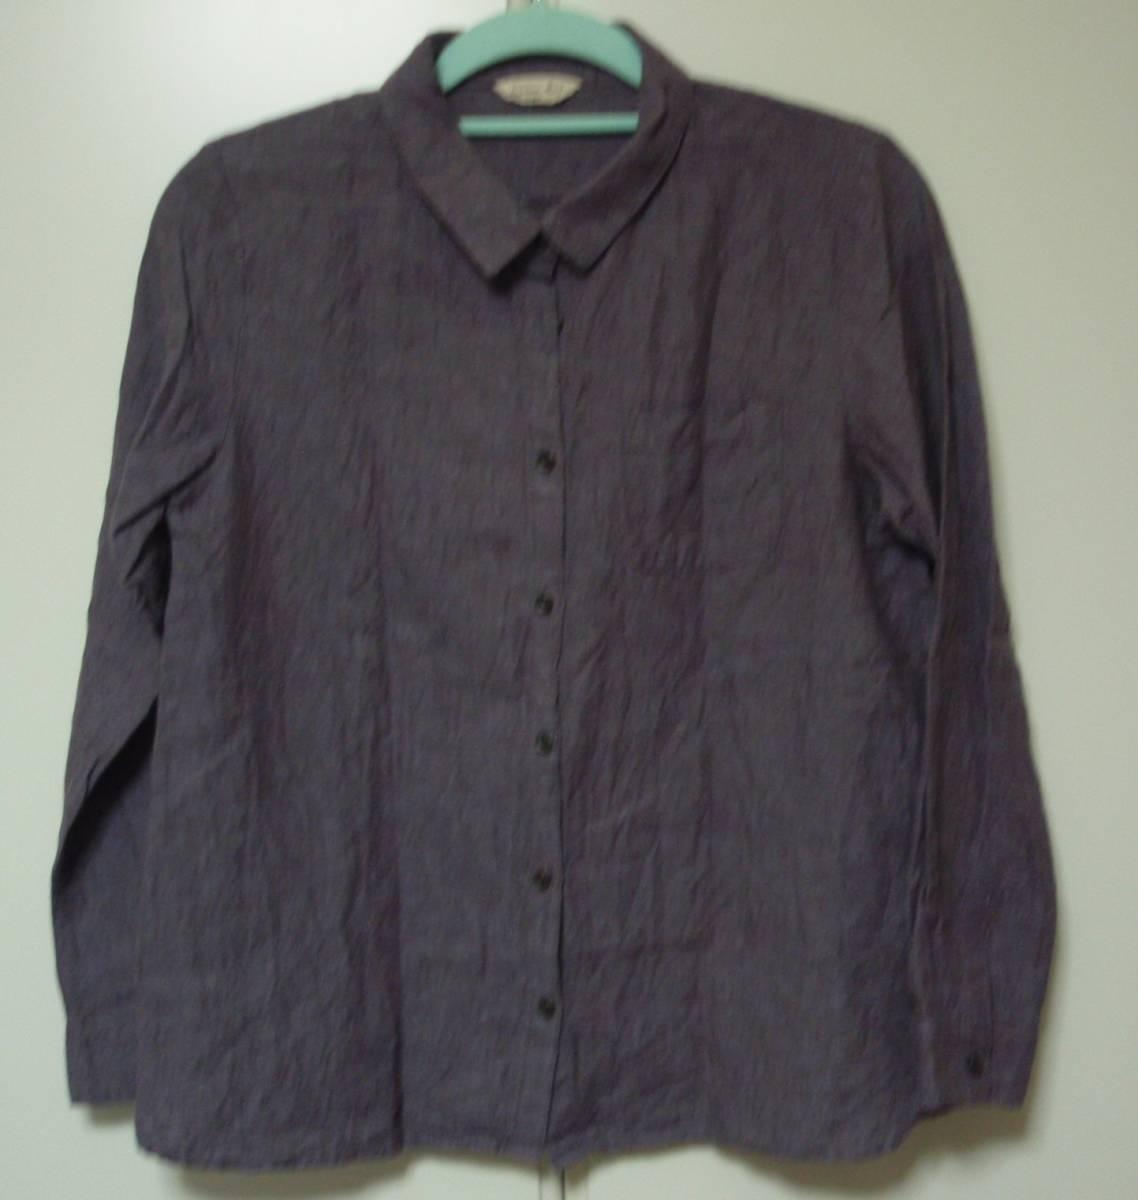 ◇Samansa Mos2 長袖ブラウス 麻74% 長袖シャツ F あずき色 サマンサモスモス_画像1